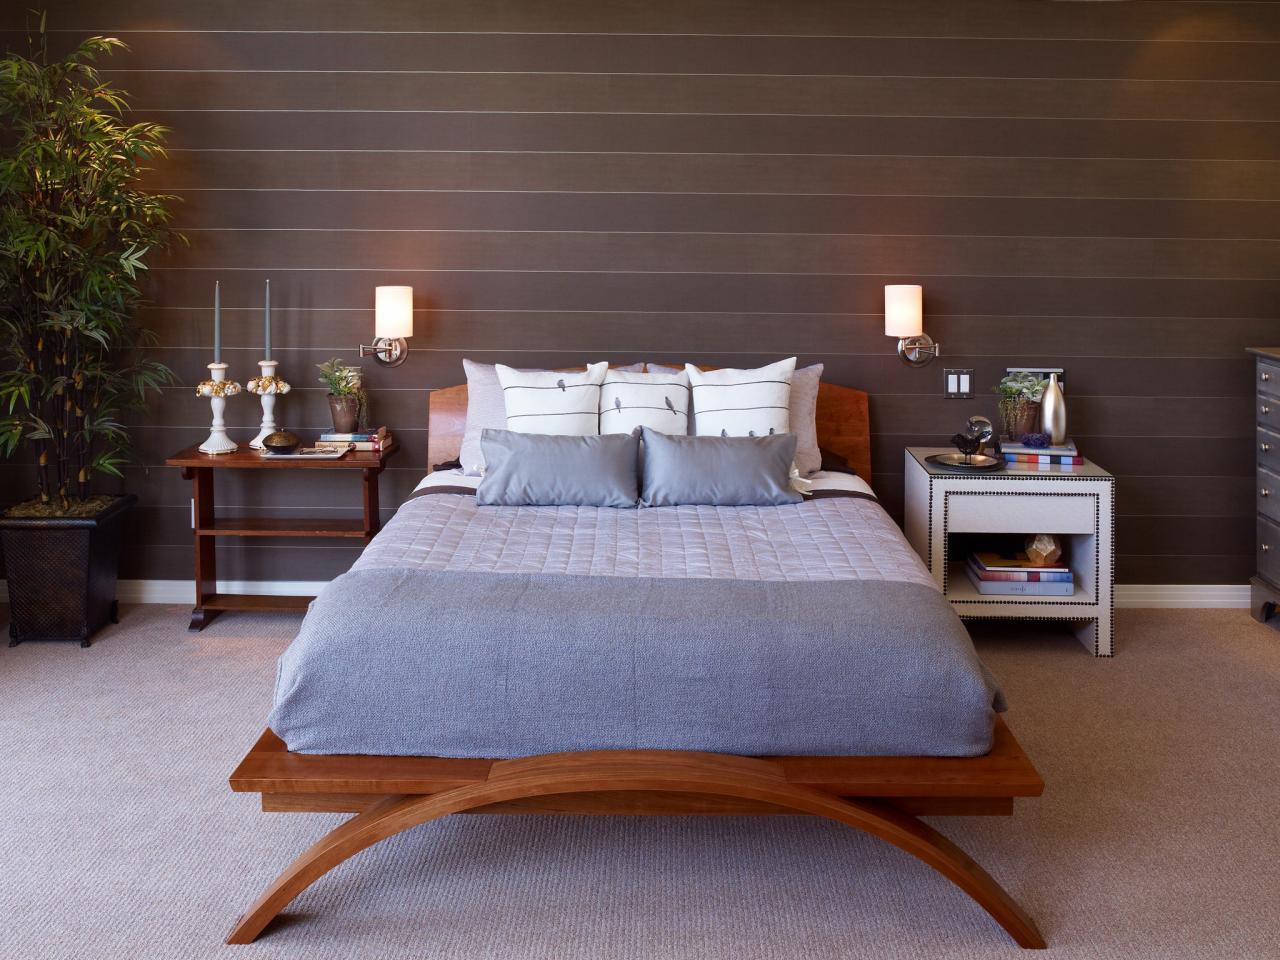 Top 10 Bedside Lights Wall Mounted 2020 Warisan Lighting